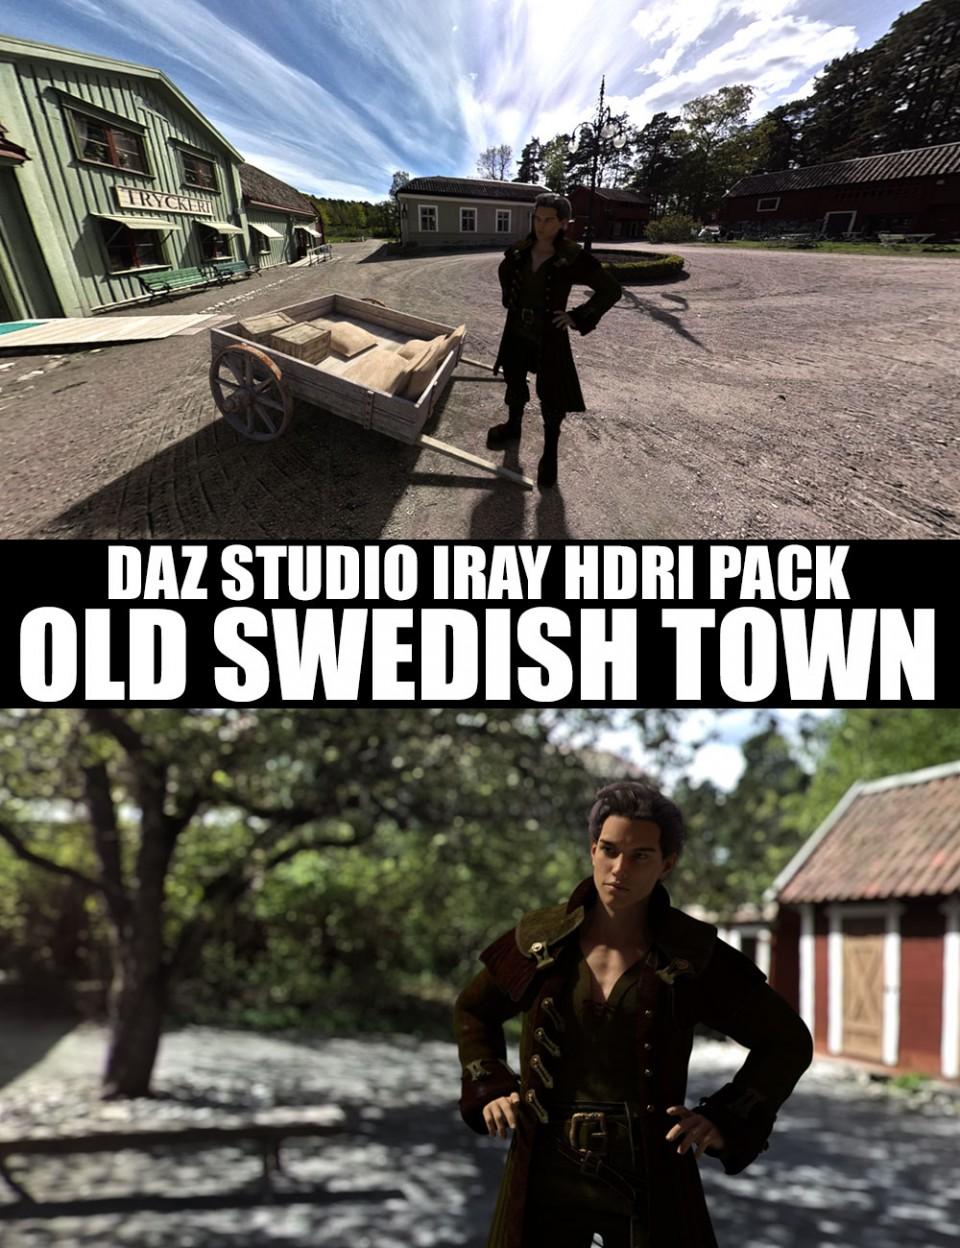 old-swedish-town-–-daz-studio-iray-hdri-pack